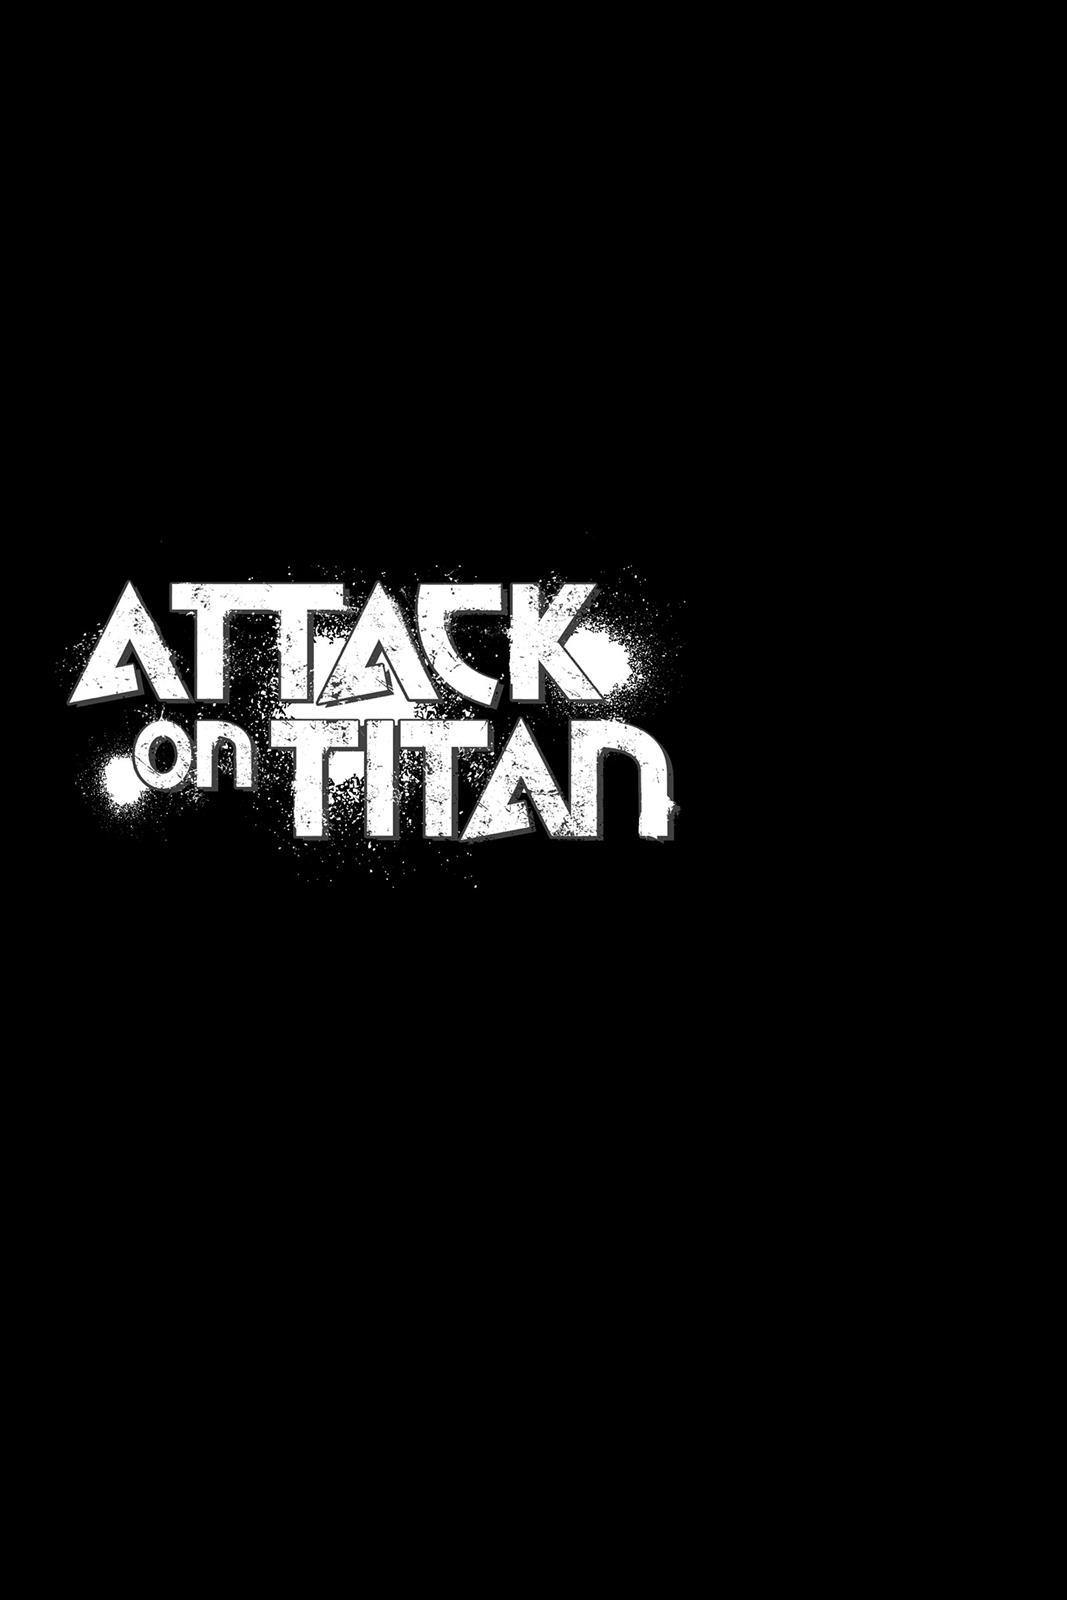 Attack On Titan, Episode 95 image 049